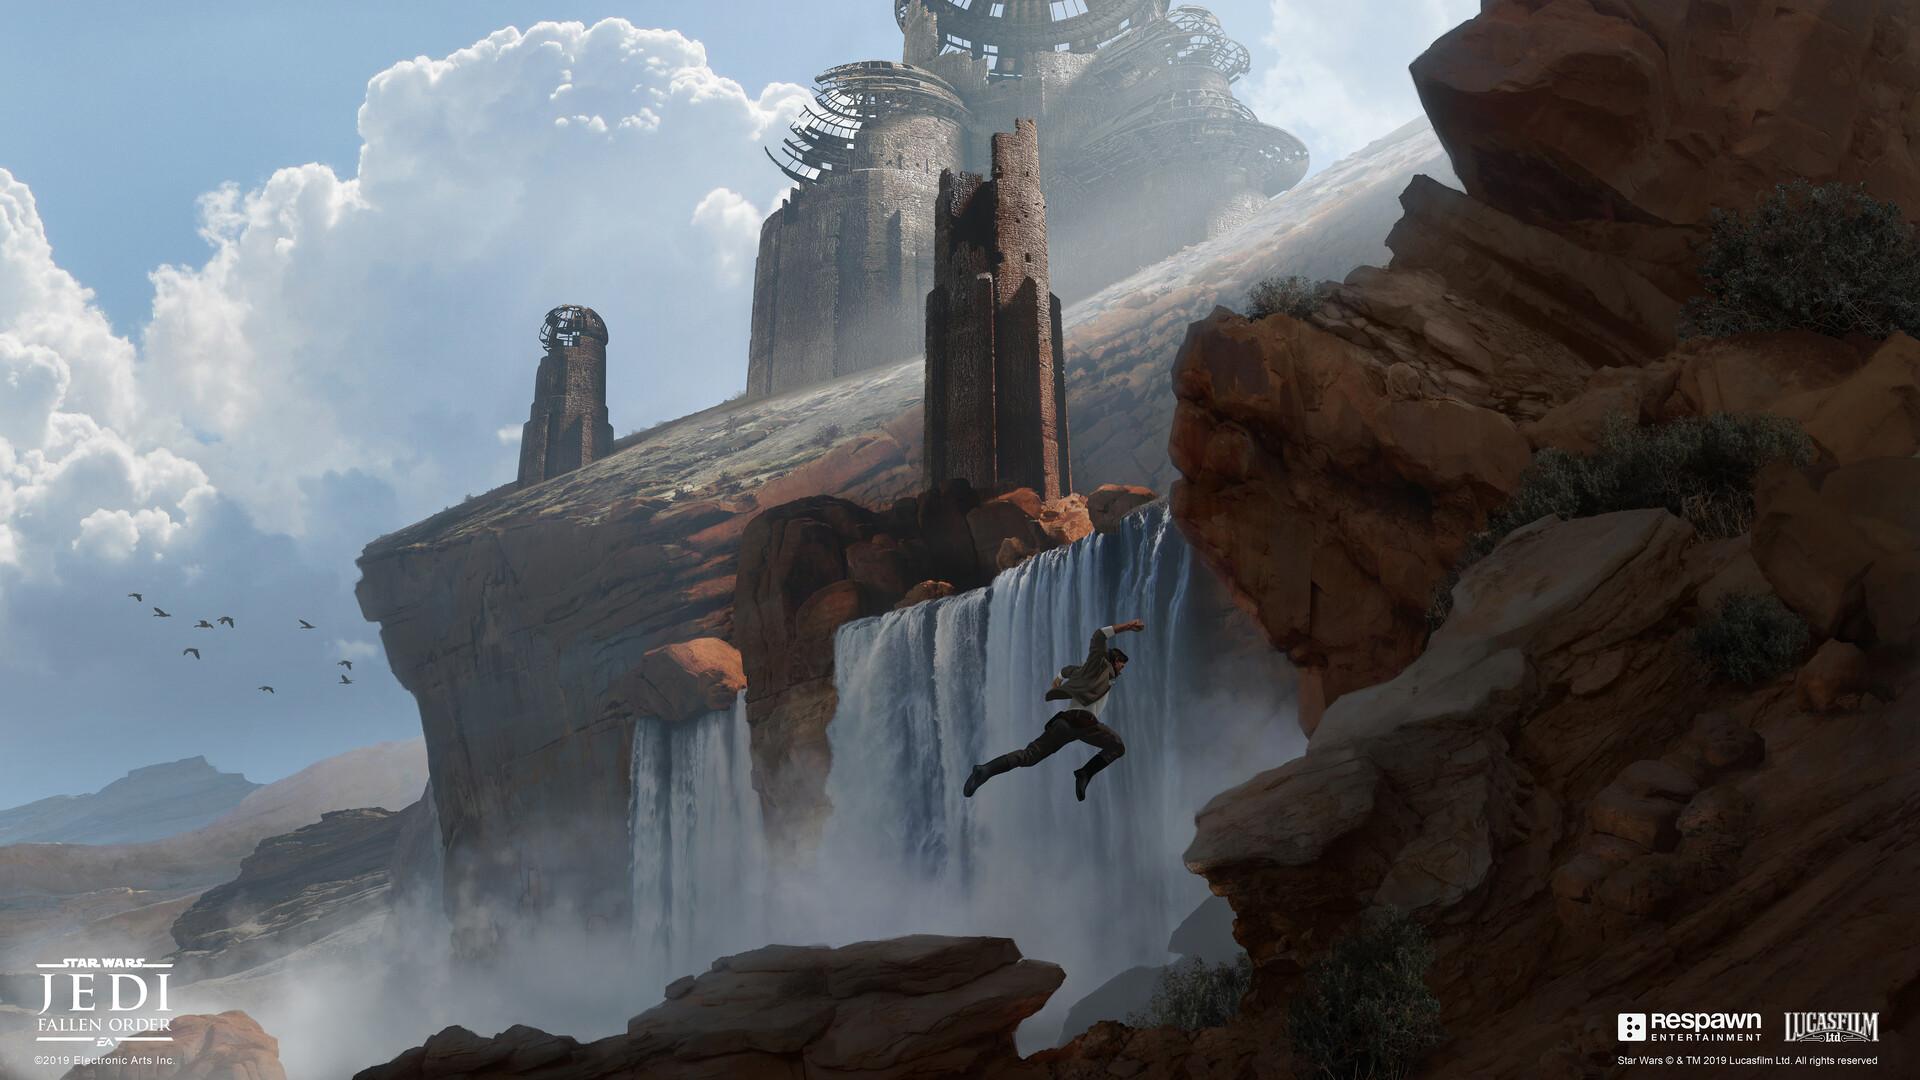 jean-francois-rey-exploration.jpg?158000